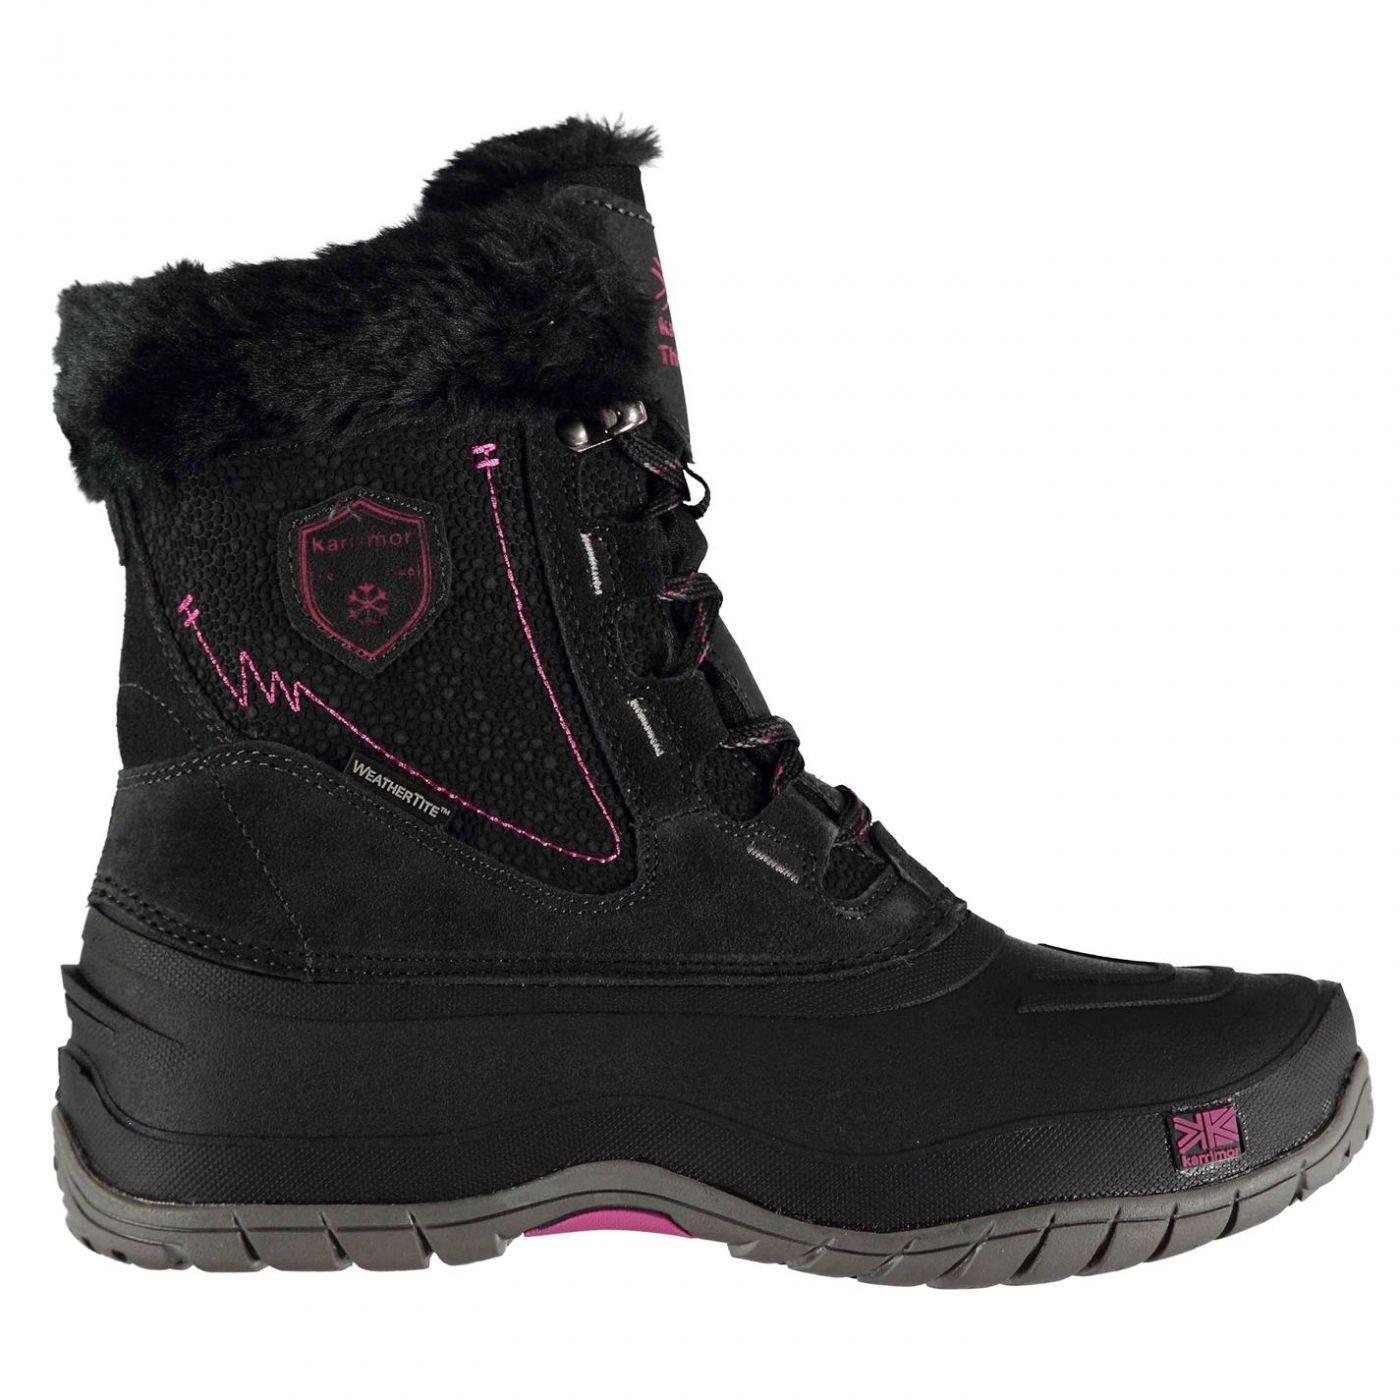 Karrimor Fur Snow Boots Ladies | Boots